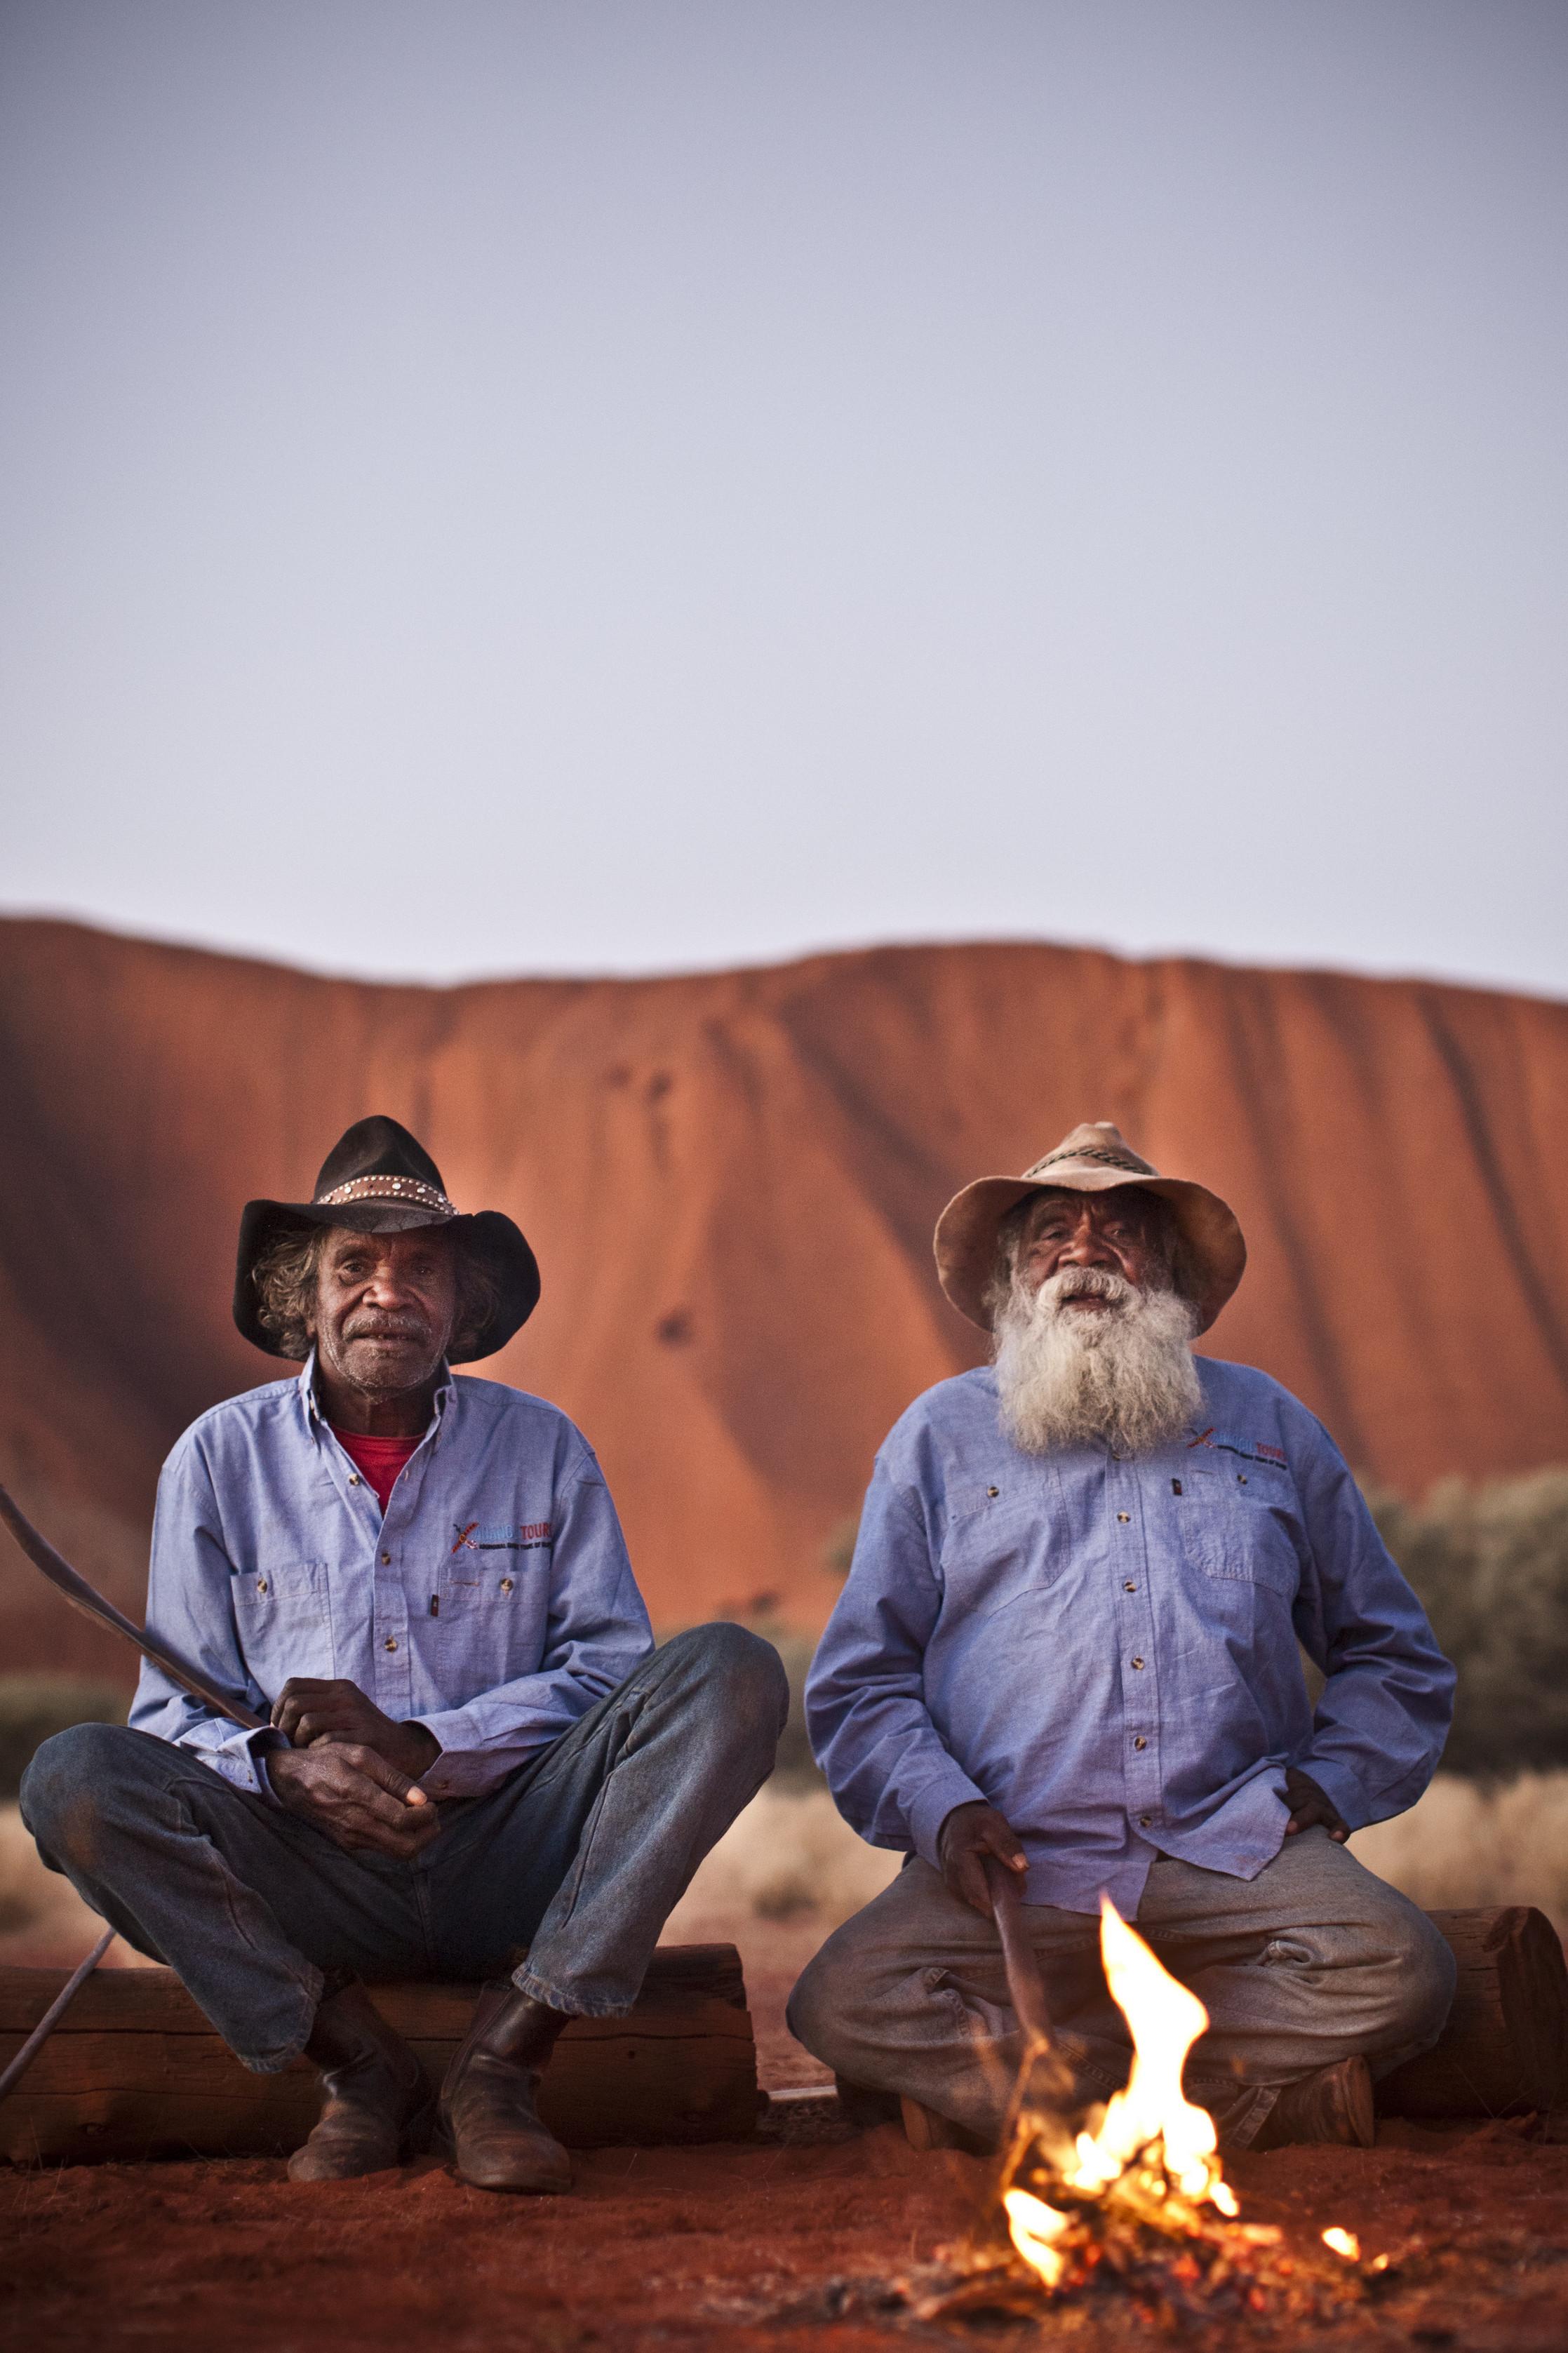 two indigenous men